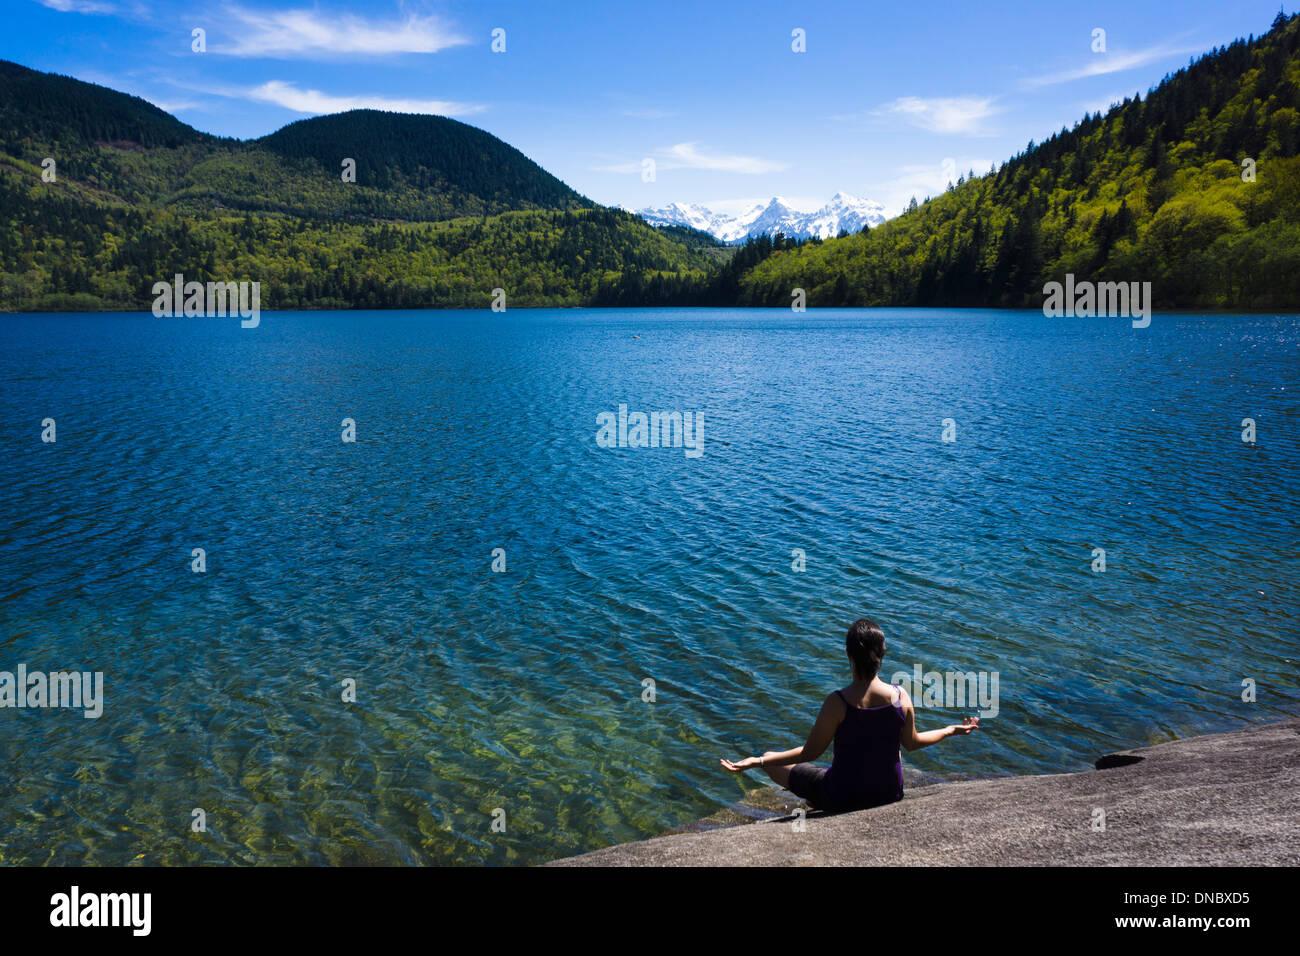 Junge Frau meditieren am Hicks Lake in Sasquatch Provincial Park, Britisch-Kolumbien, Kanada Stockbild